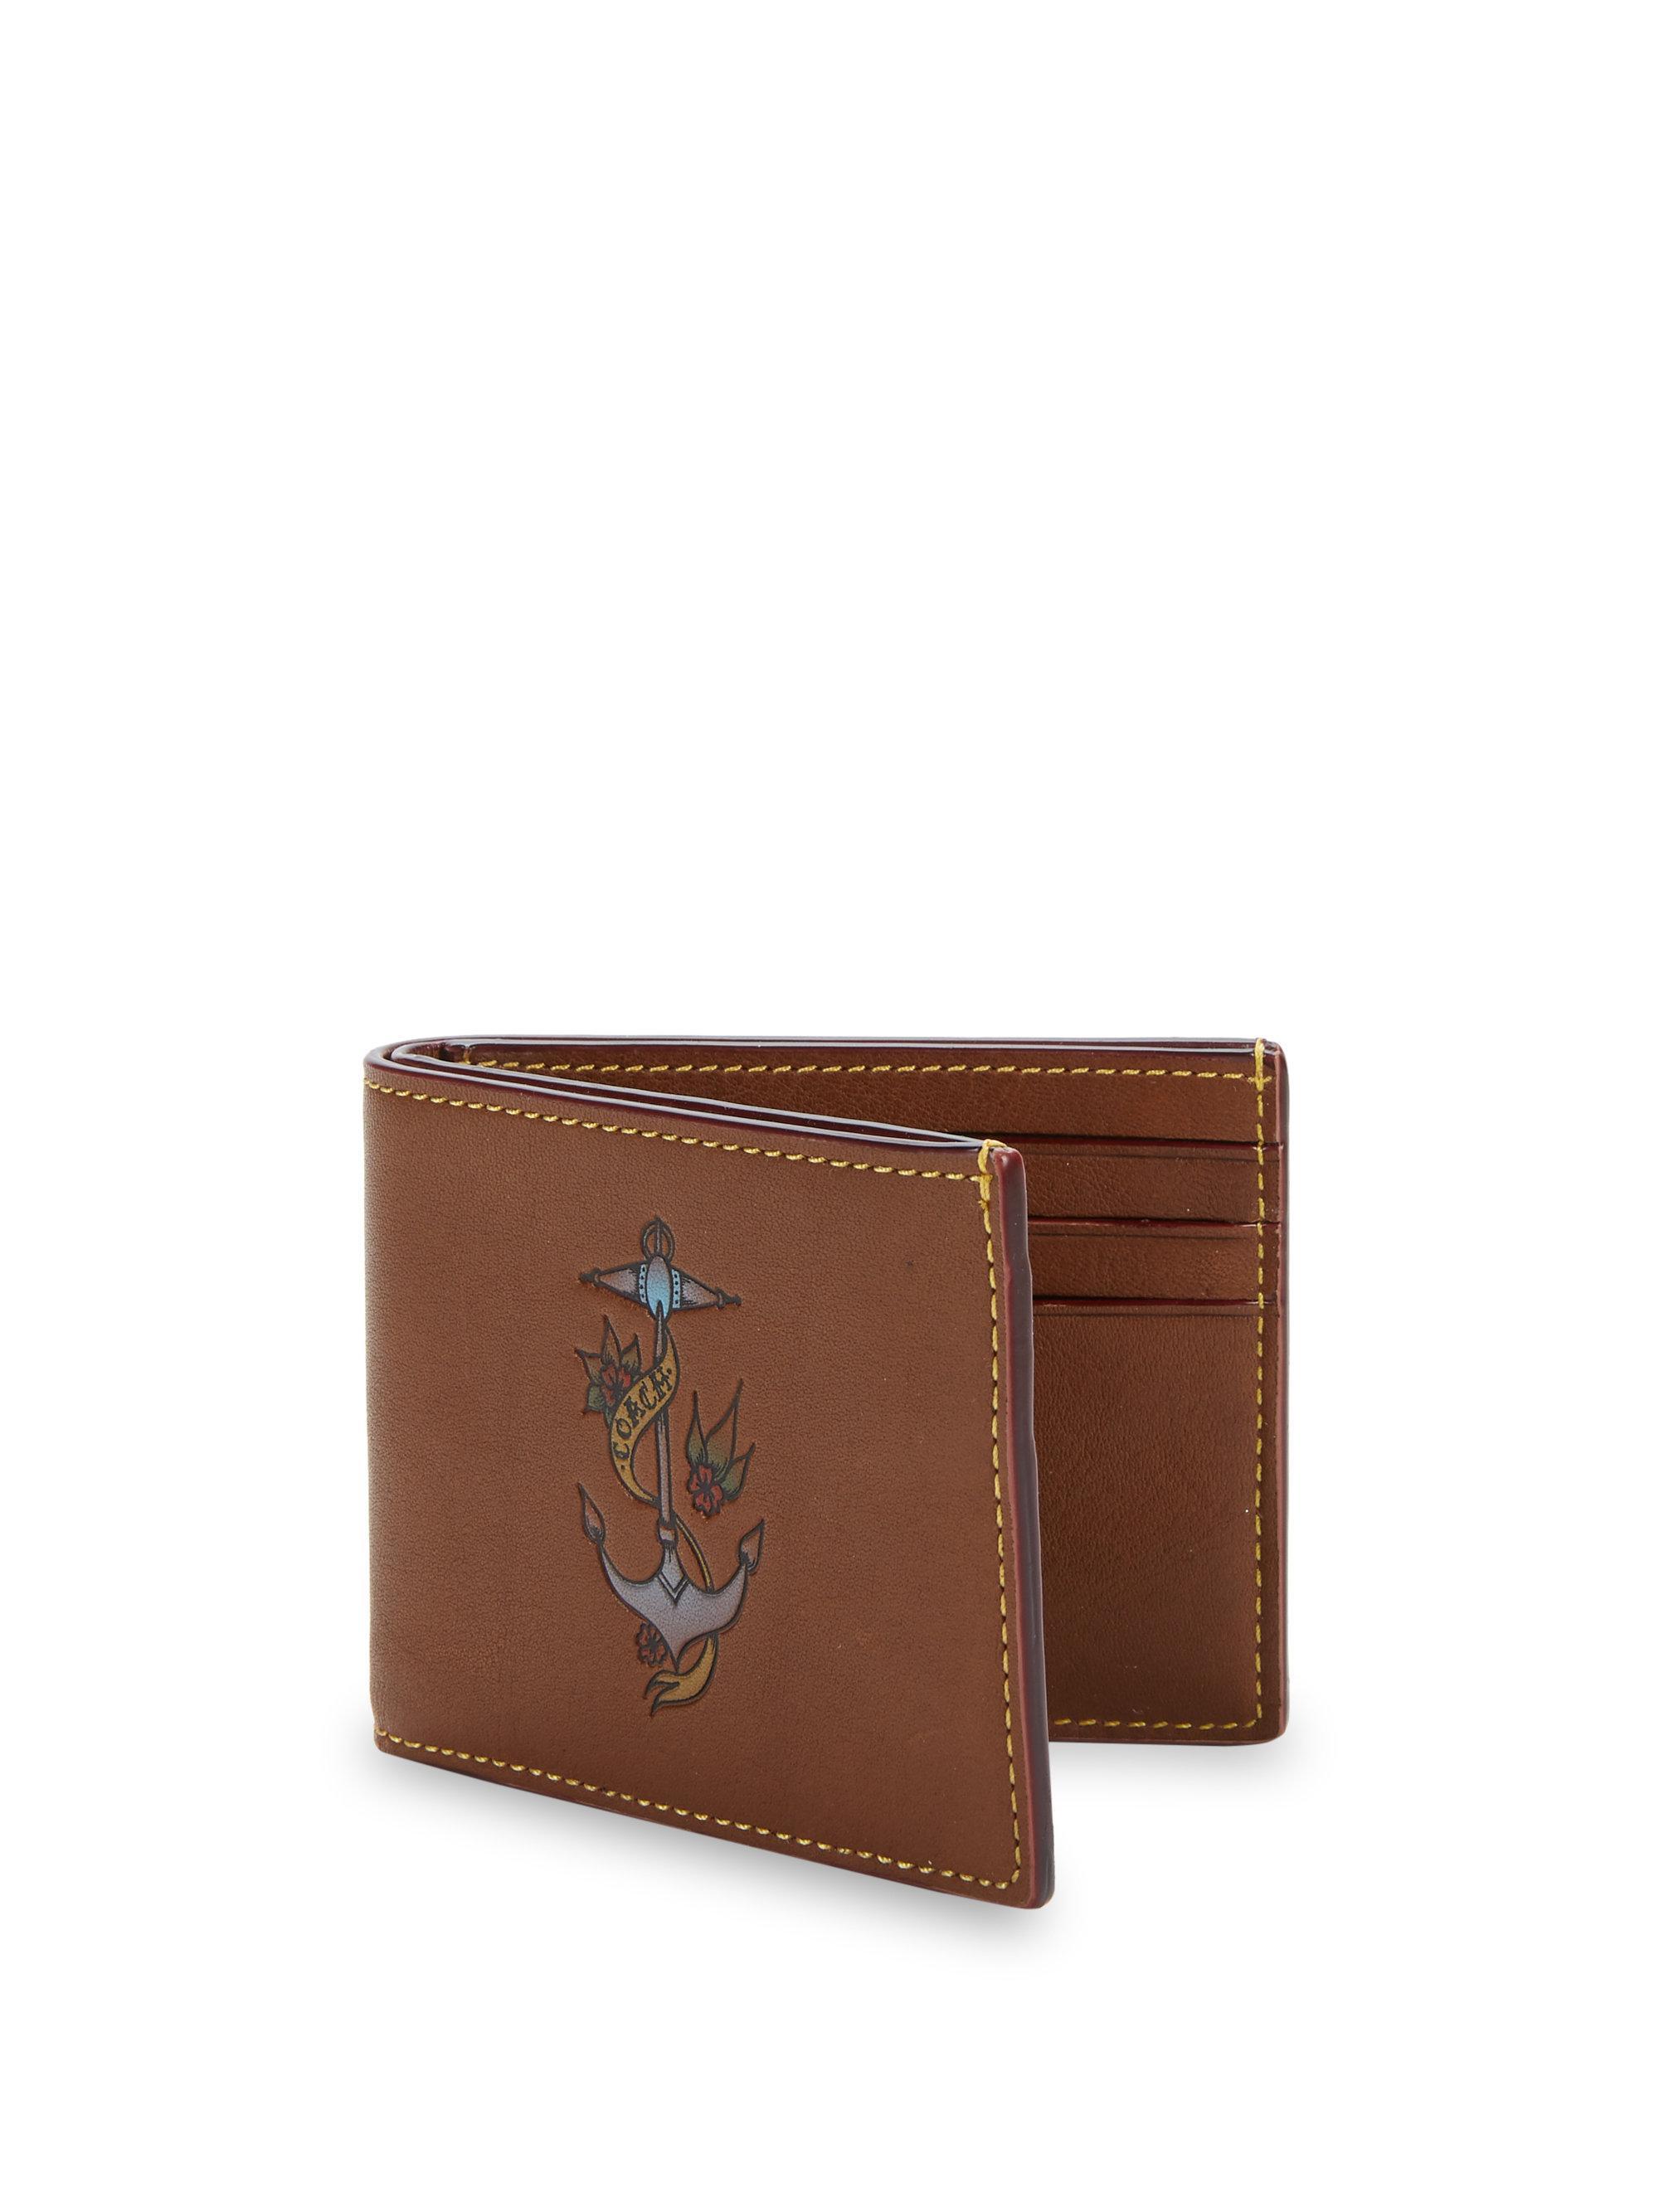 8e72d7631521 Coach 1941 Slim Billfold Tattoo Wallet in Brown for Men - Lyst